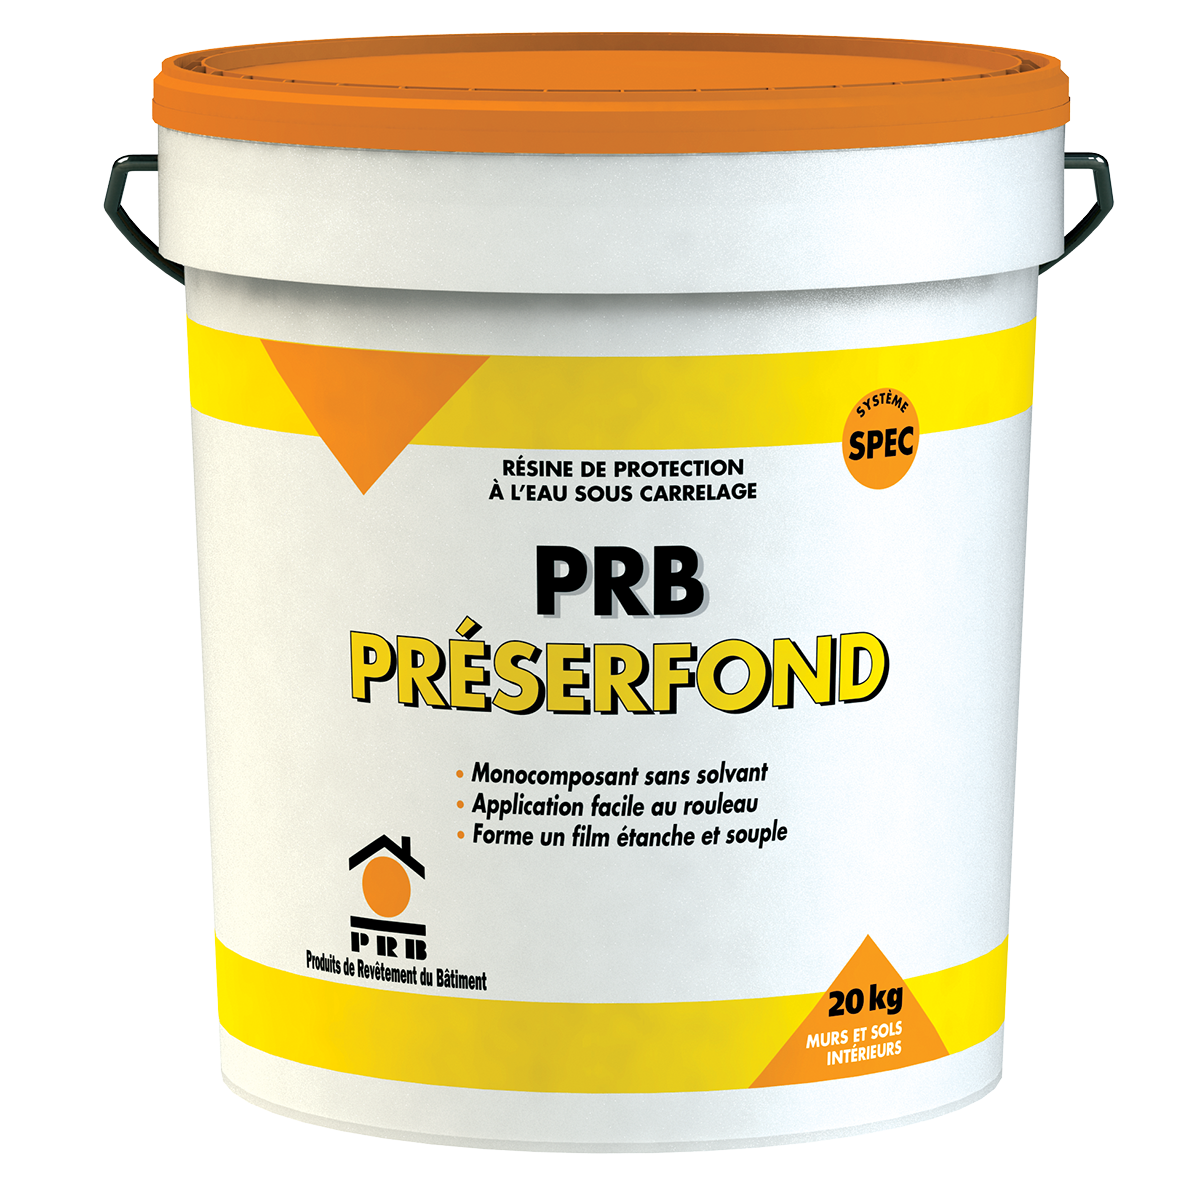 PRB PRESERFOND 20 KG